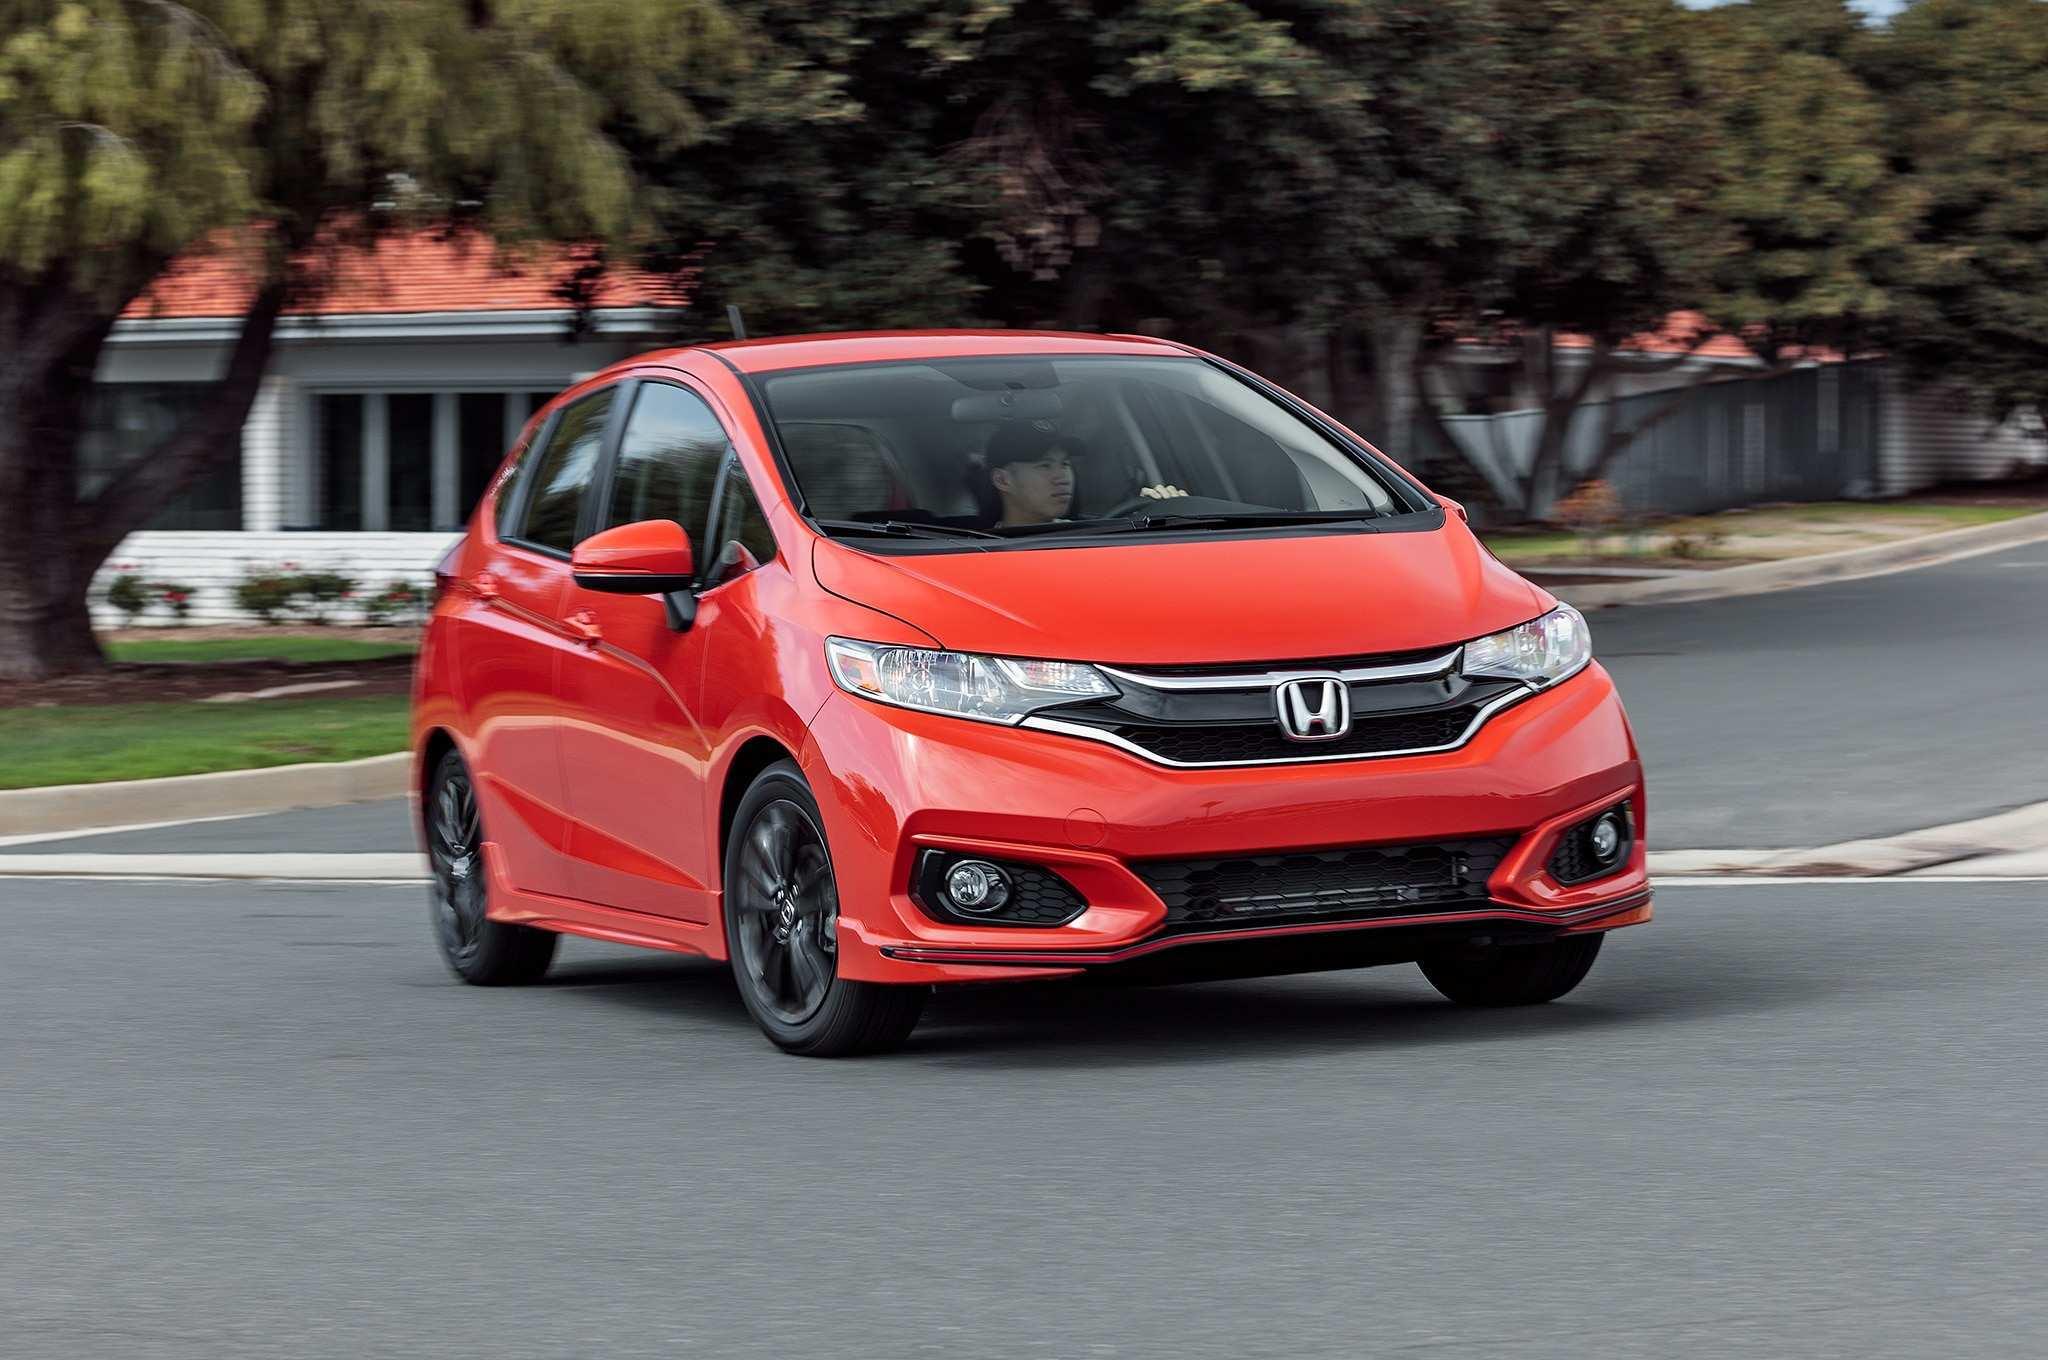 30 Great 2020 Honda Fit News Specs for 2020 Honda Fit News